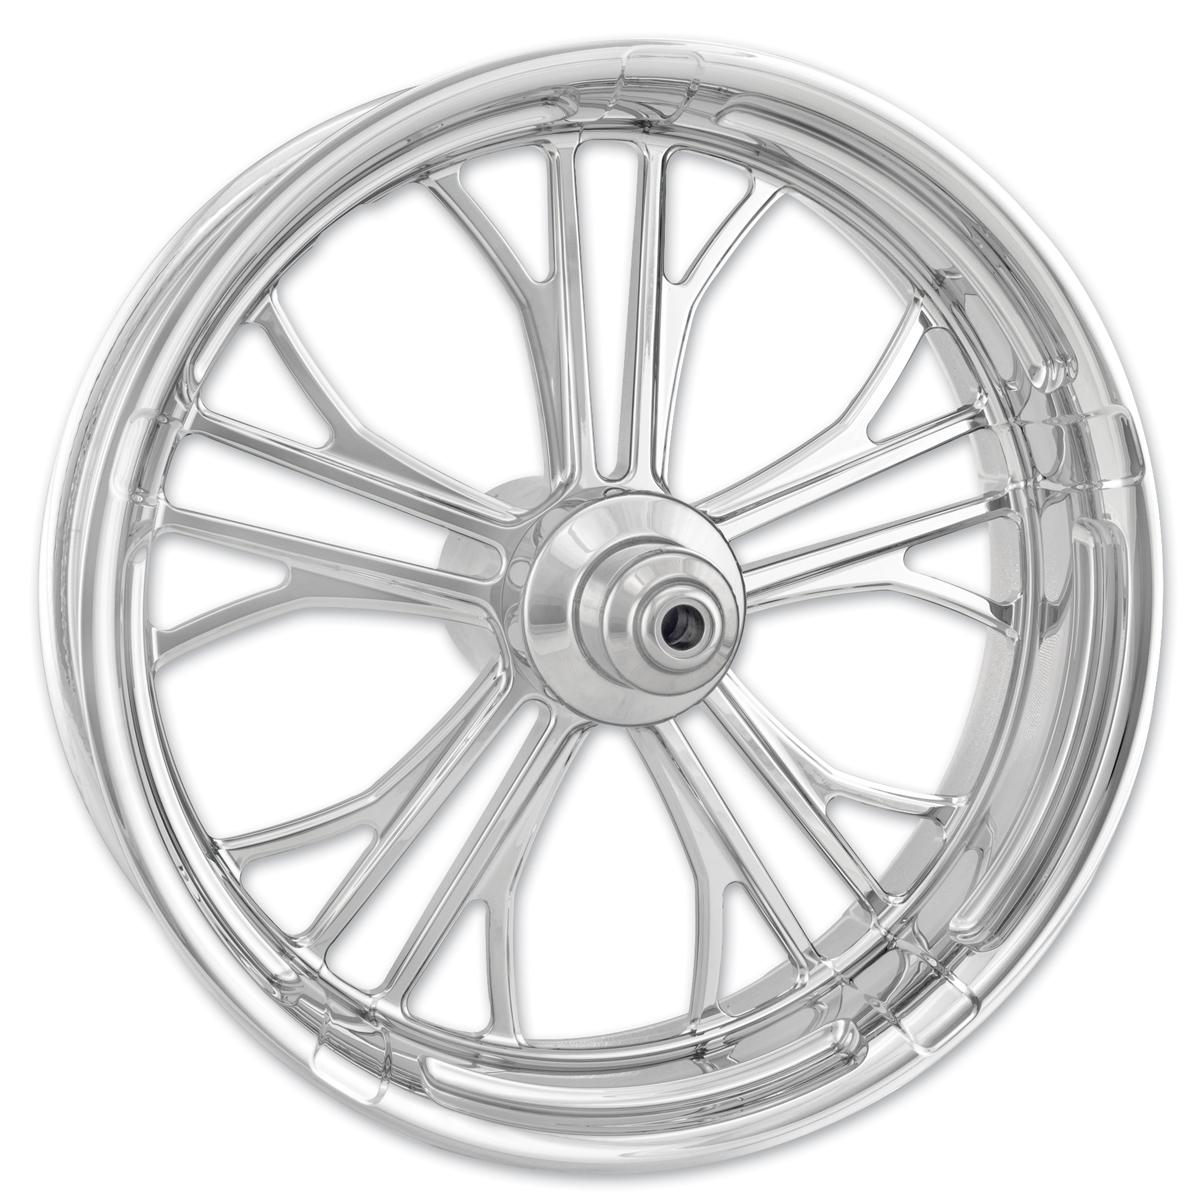 Performance Machine Dixon Chrome Front Wheel 23x3.5